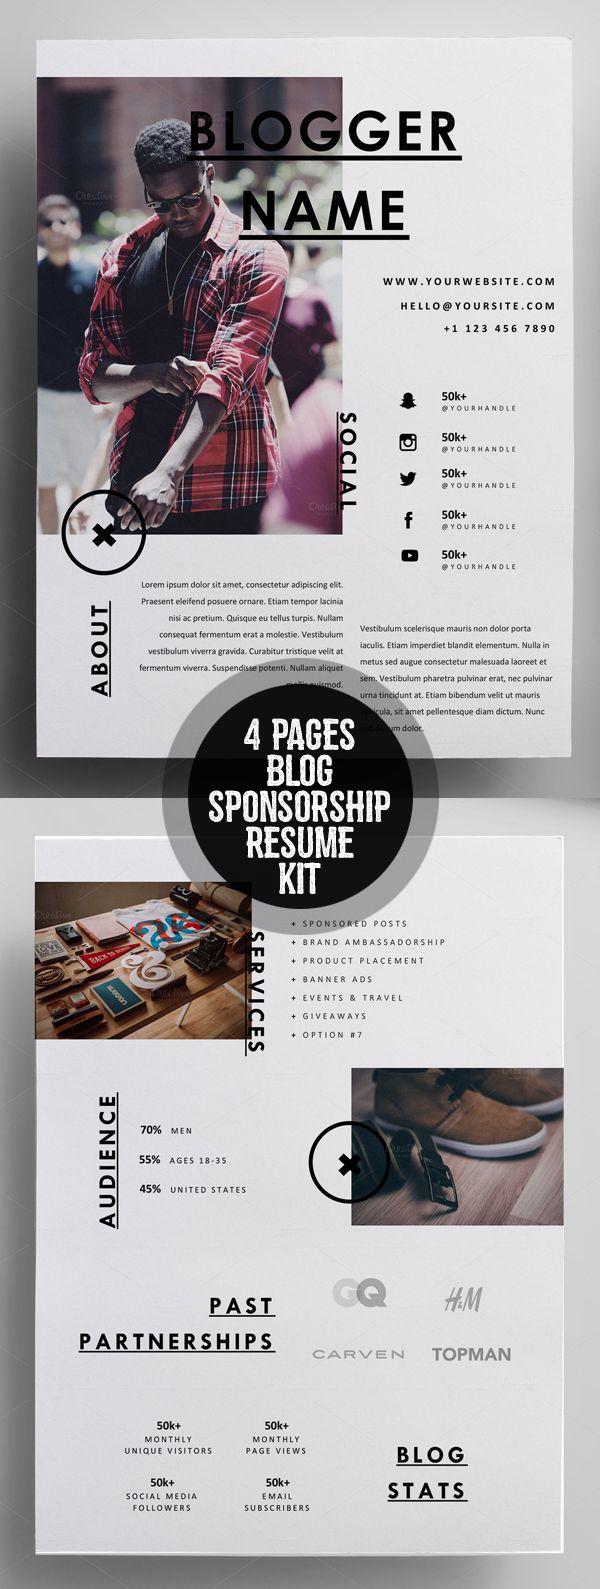 Creative 4 Pages Blog Sponsorship Kit Resume Template – Sponsorship Resume Template